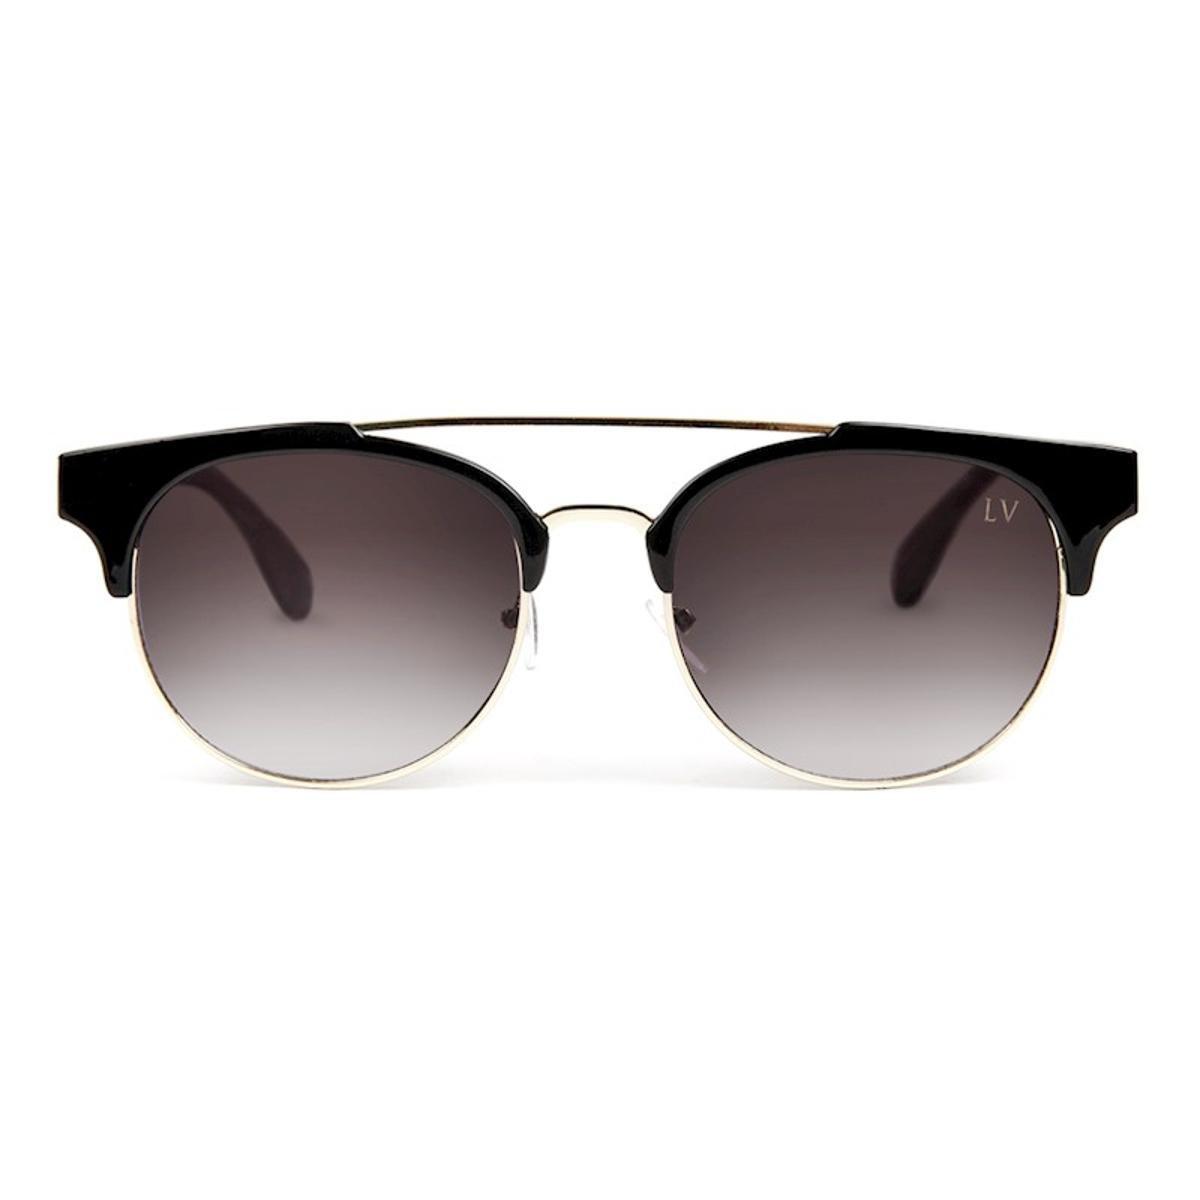 a15204f9bf56c Óculos de Sol Katarina Magalhães Luma Ventura Kristin Feminino ...